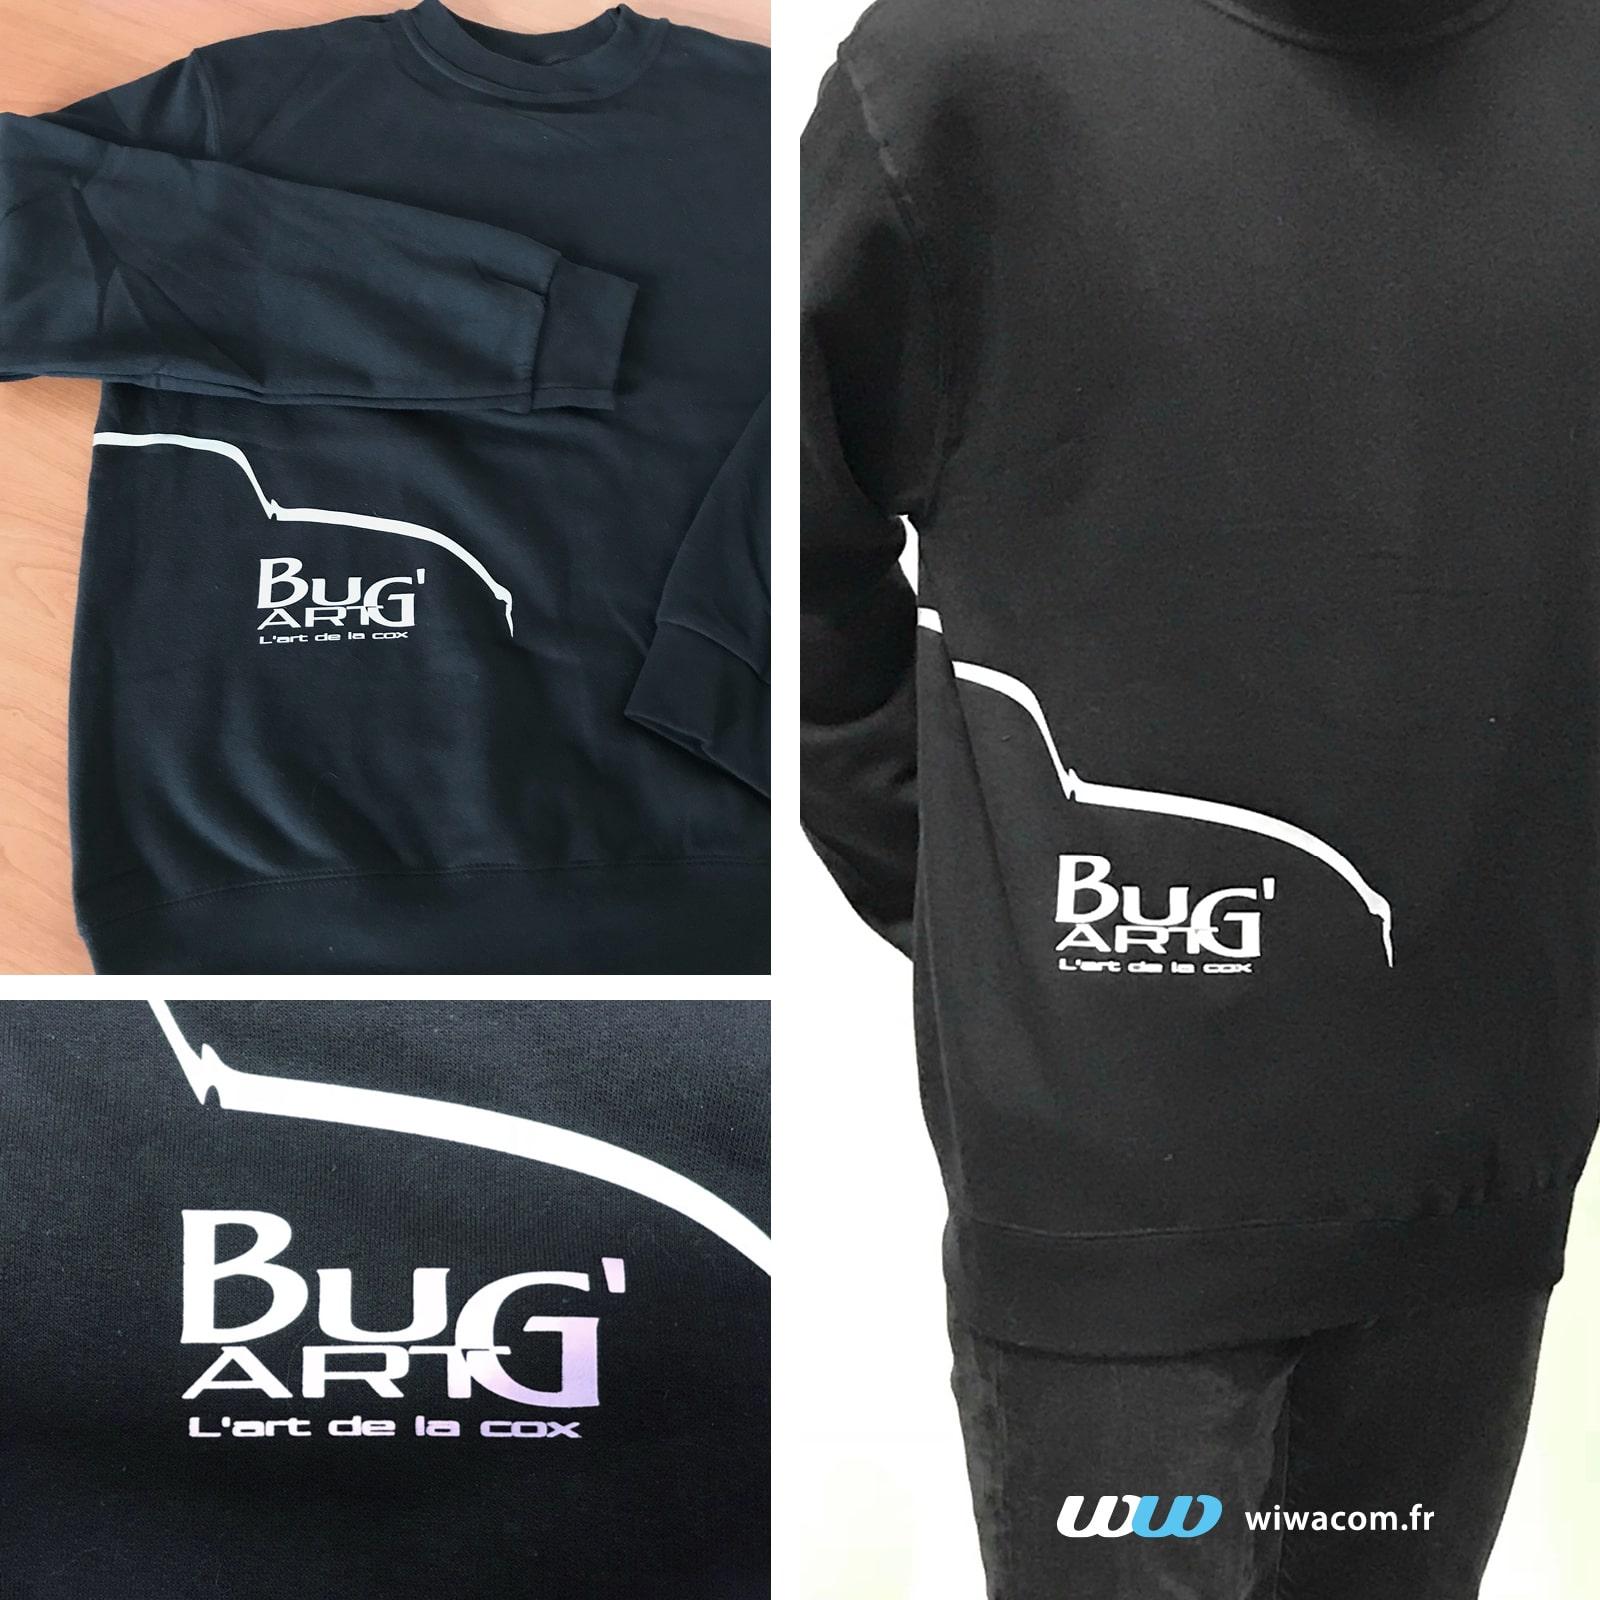 Bugart - Pull